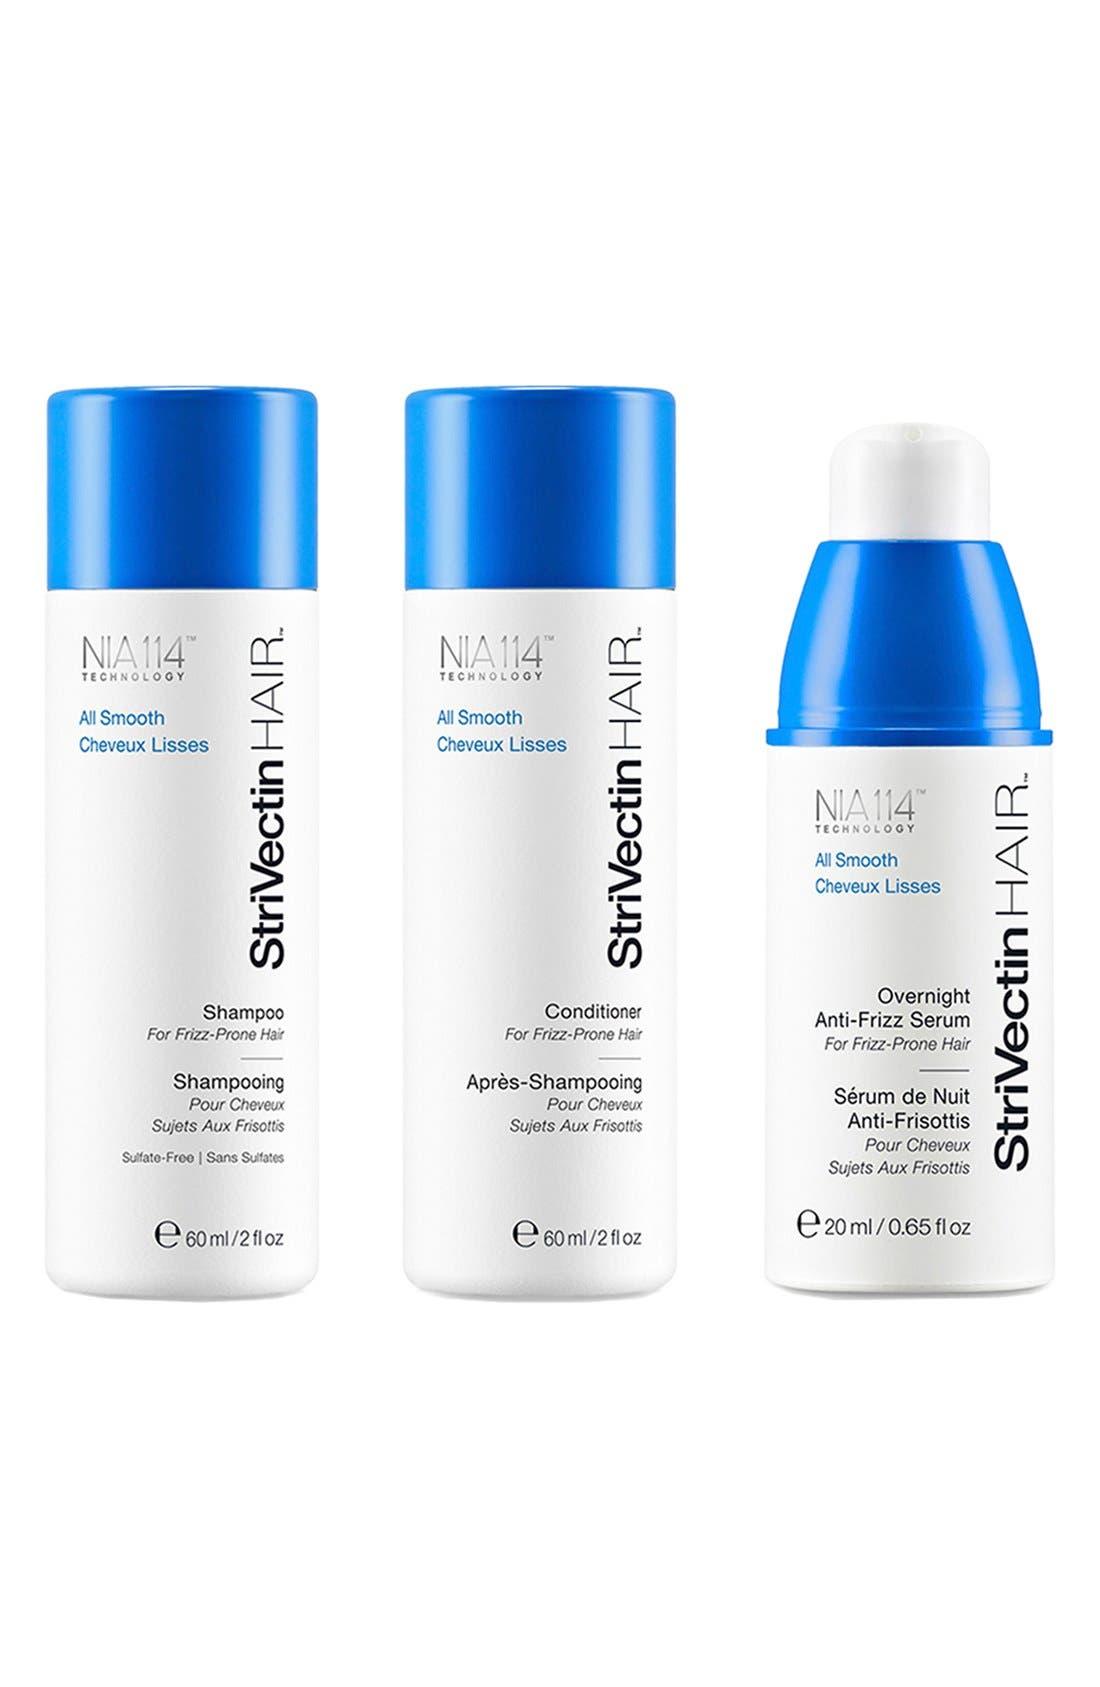 StriVectinHAIR™ All Smooth Starter Kit